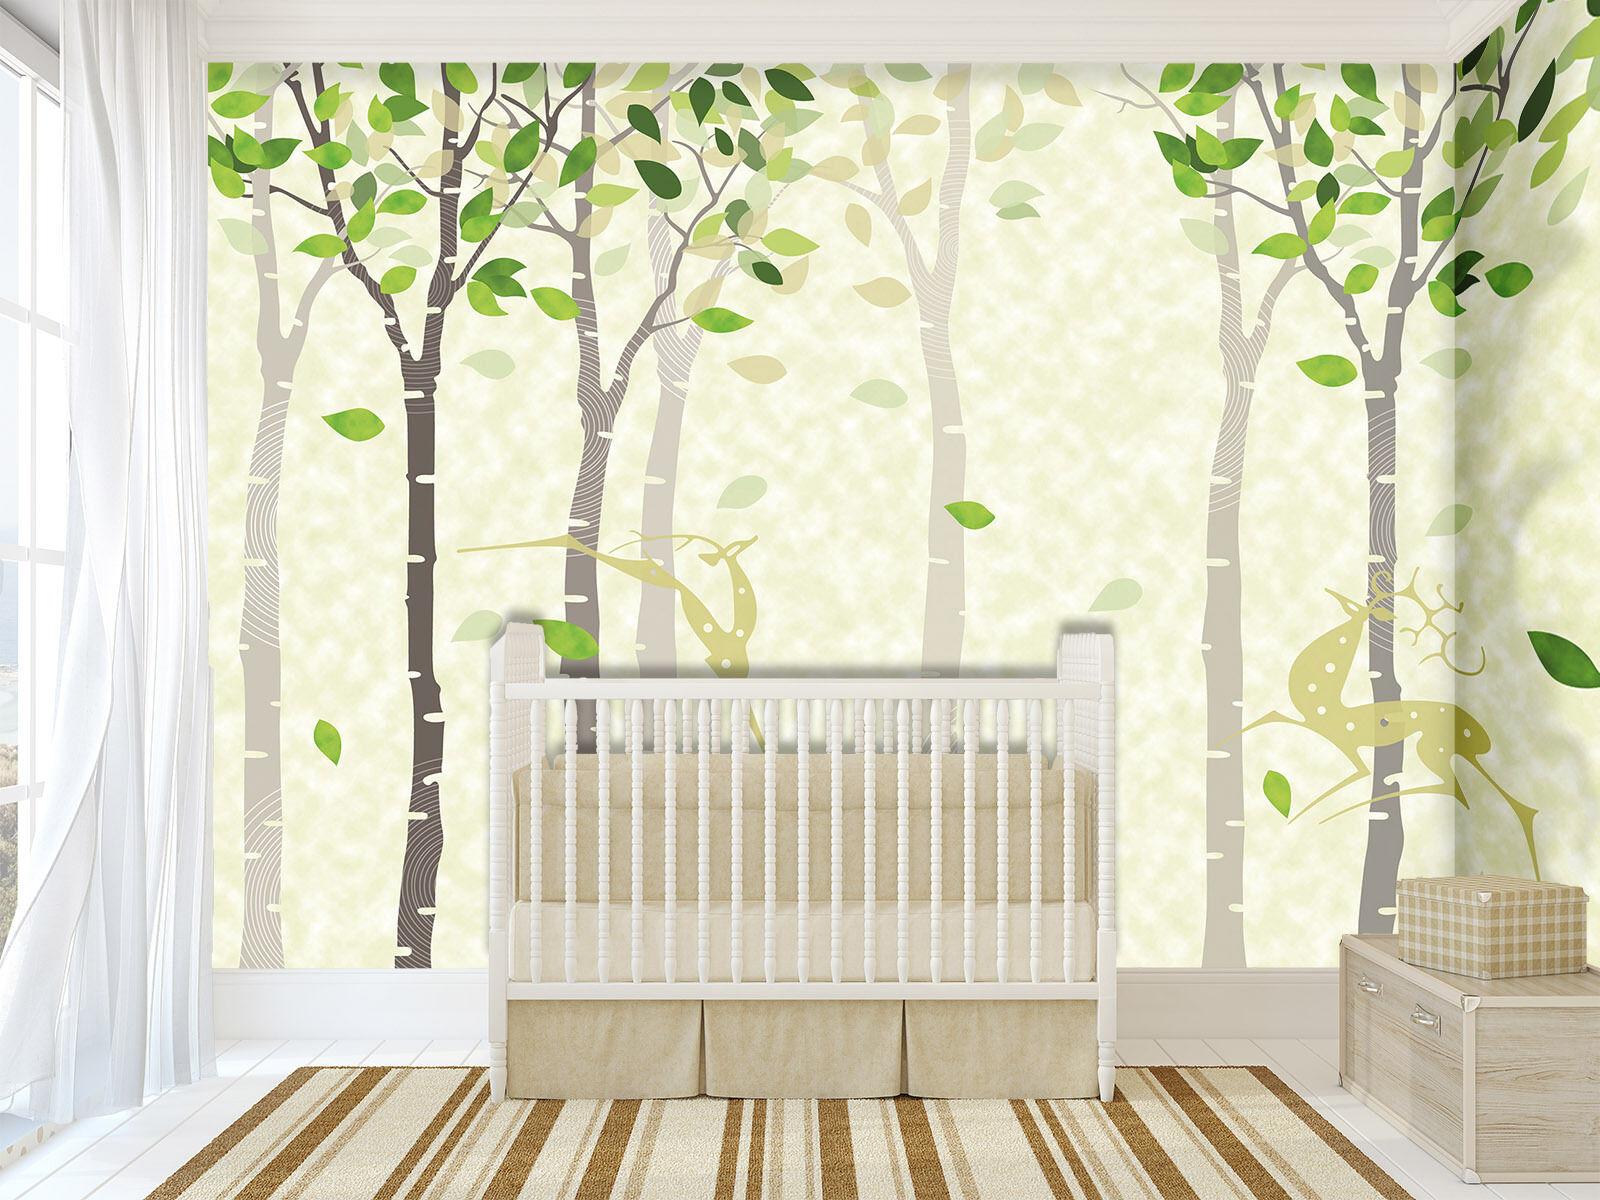 3D Spring Little Tree 92 Wall Paper Decal Dercor Home Kids Nursery Mural  Home